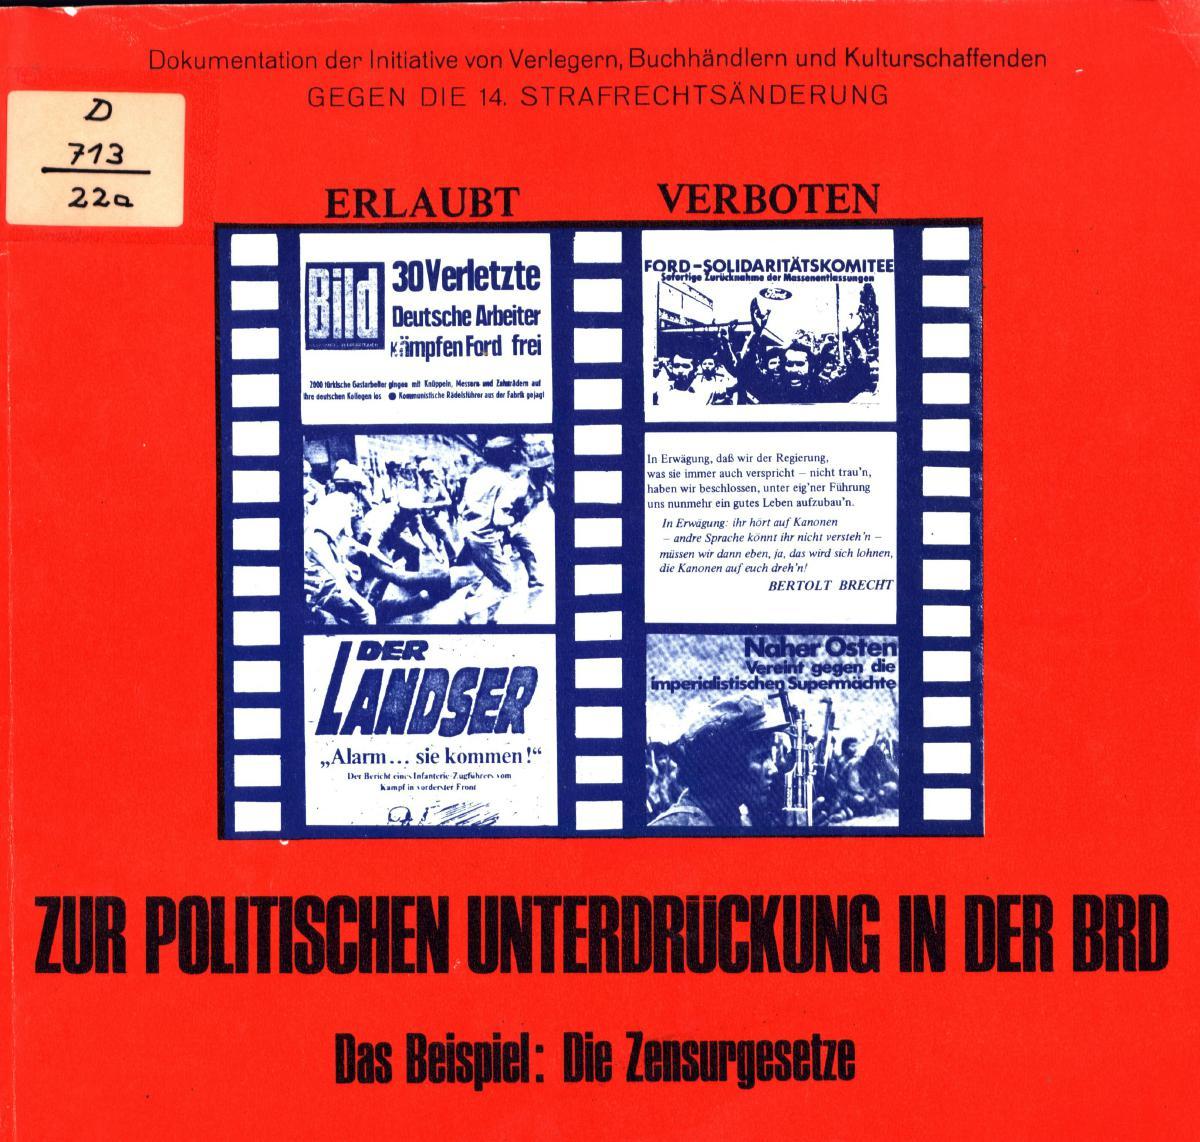 REP_VLB_1976_Die_Zensurgesetze_01